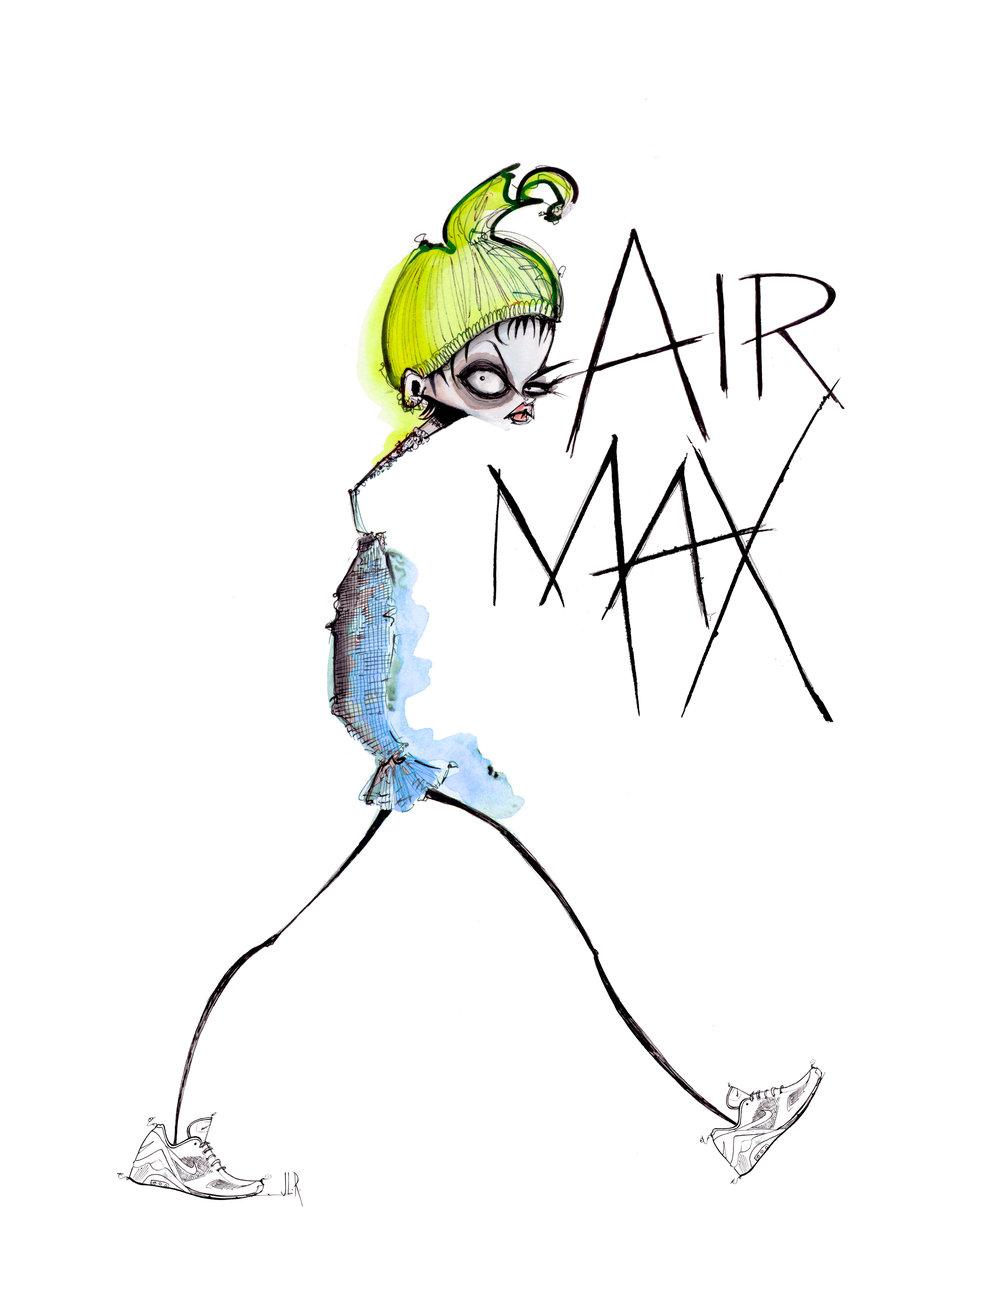 Air Max Con 2016